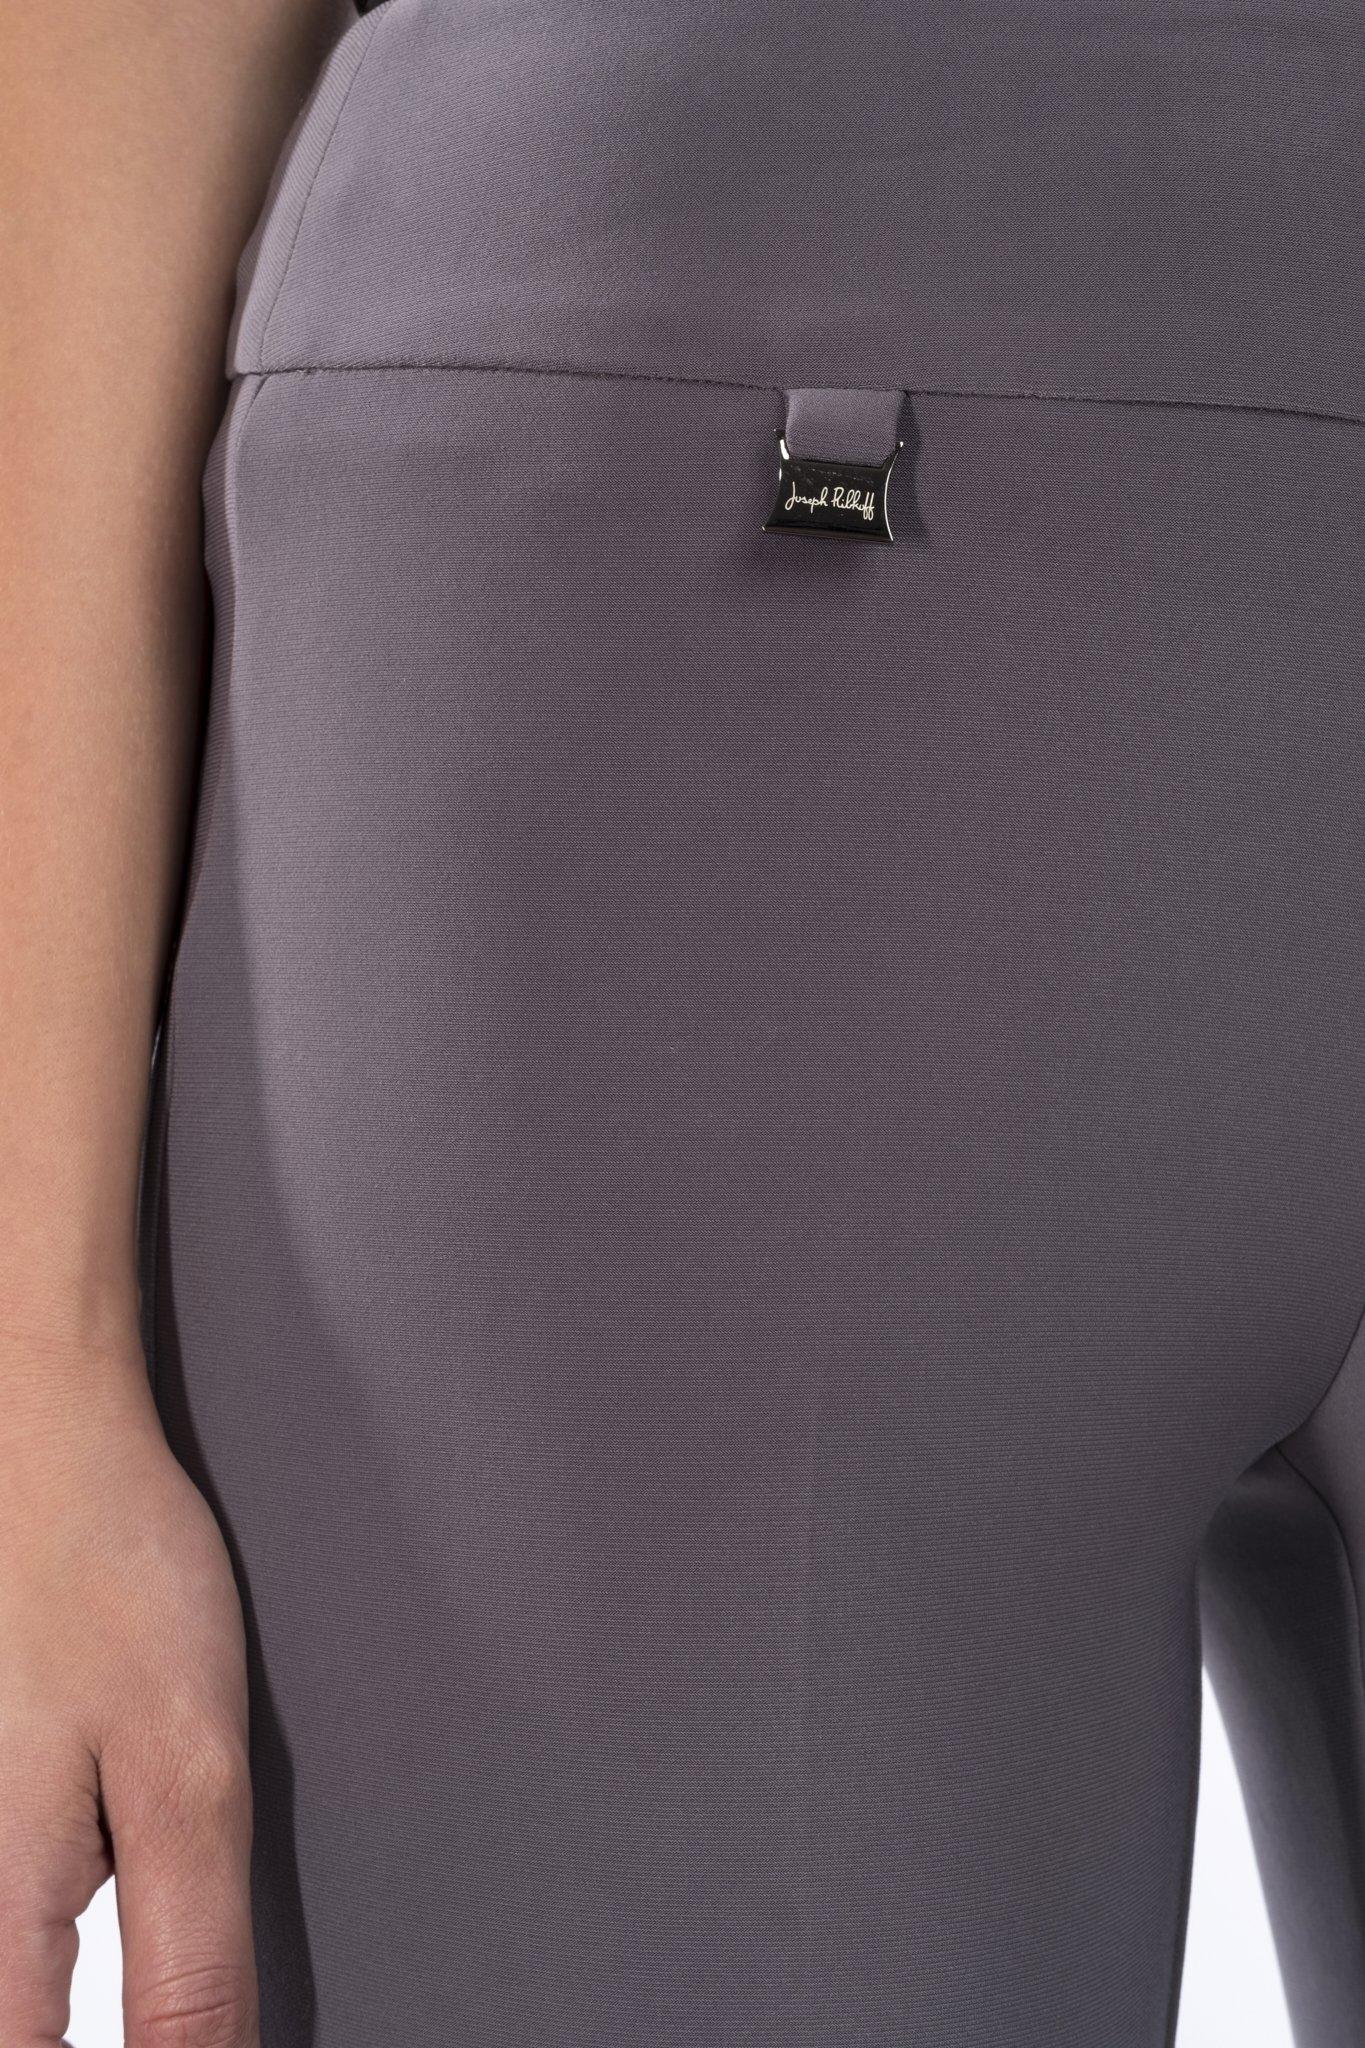 Joseph Ribkoff Ankle Length Wide Waistband Tailored Pant Zipperless - Style 144092 - Size 18 by Joseph Ribkoff (Image #4)